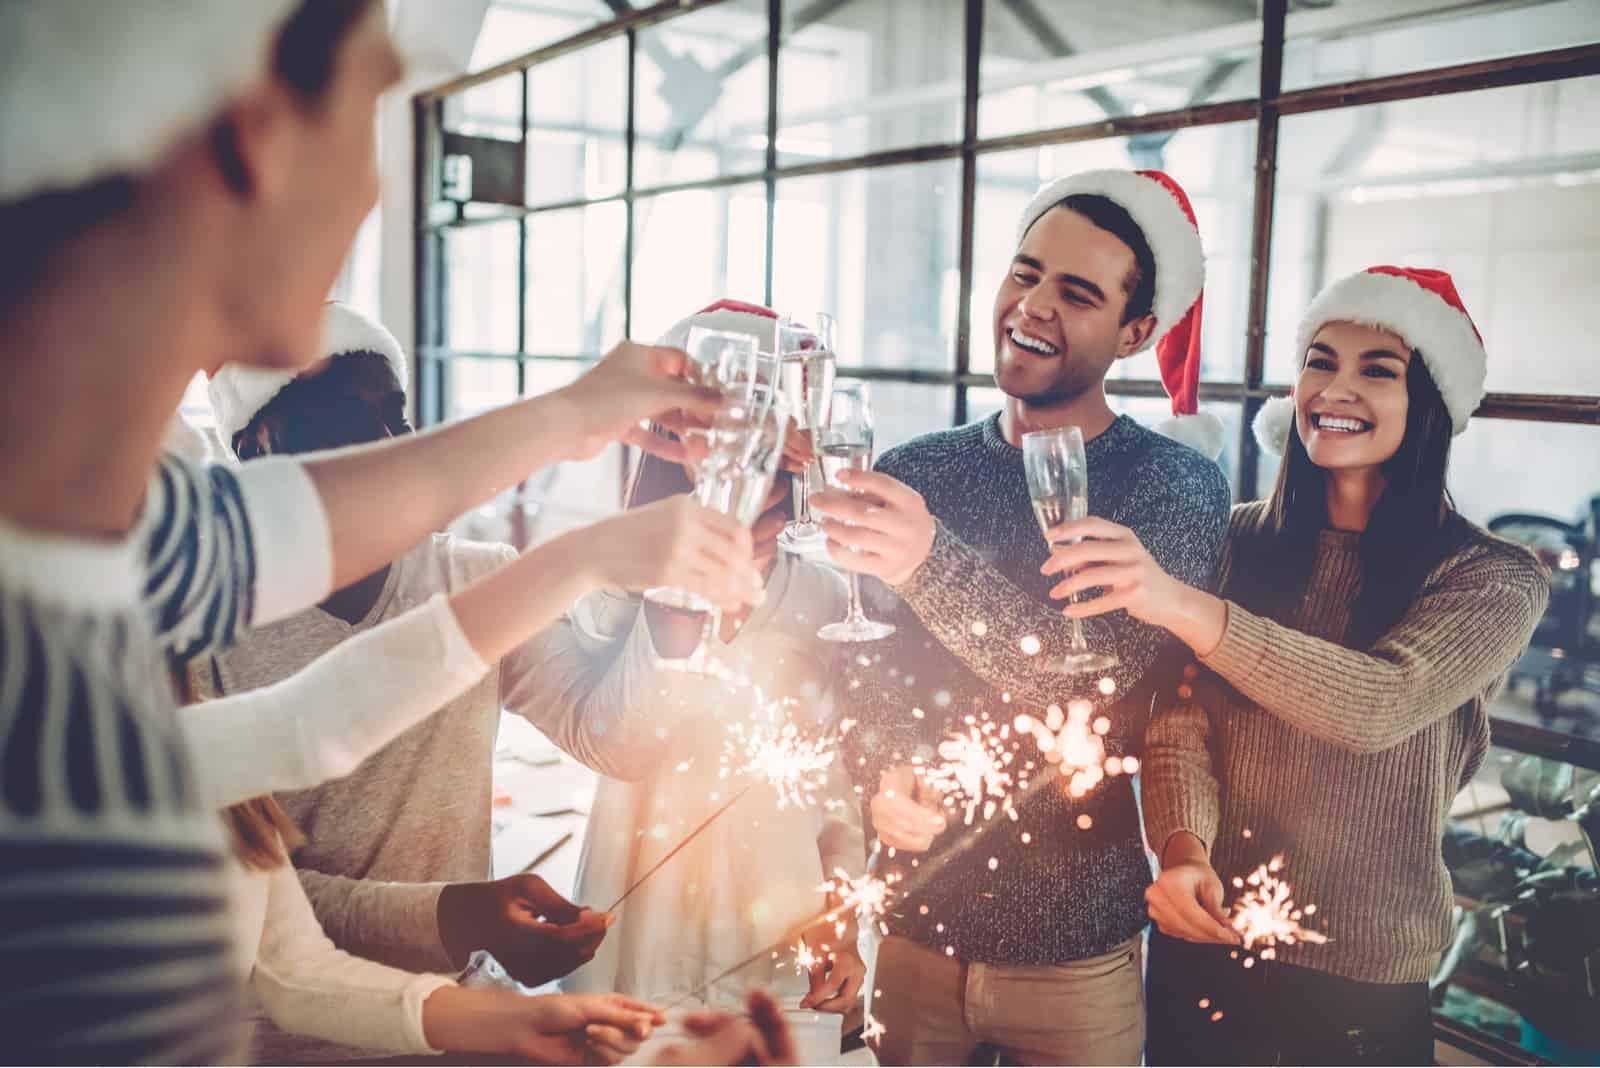 människor firar semester i modernt kontor